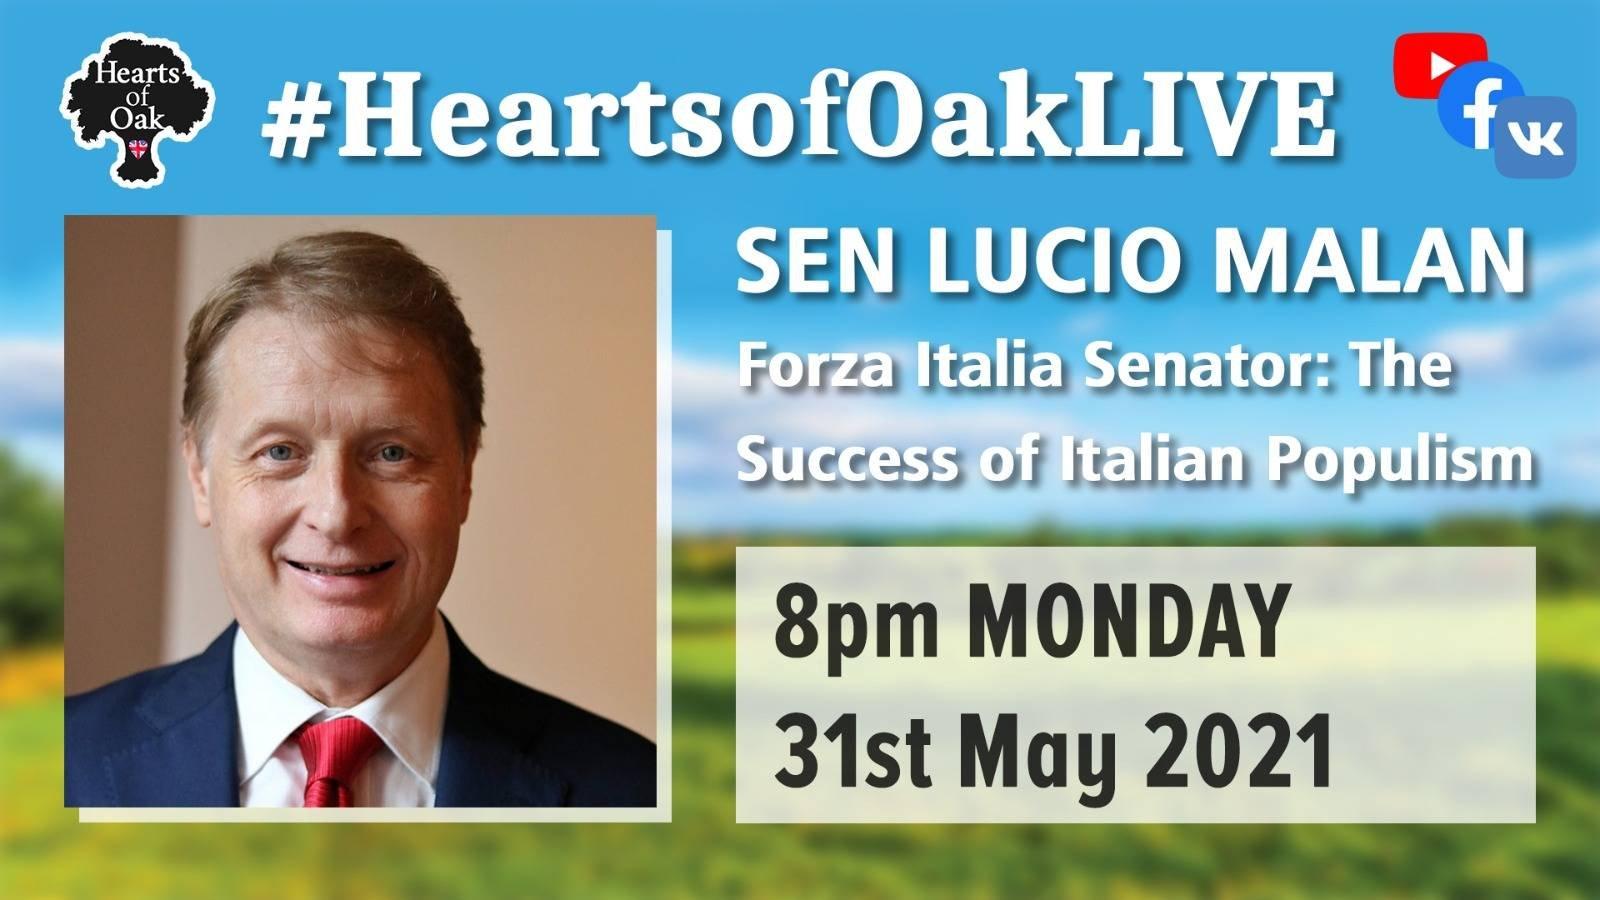 Senator Lucio Malan: The Success of Italian Populism